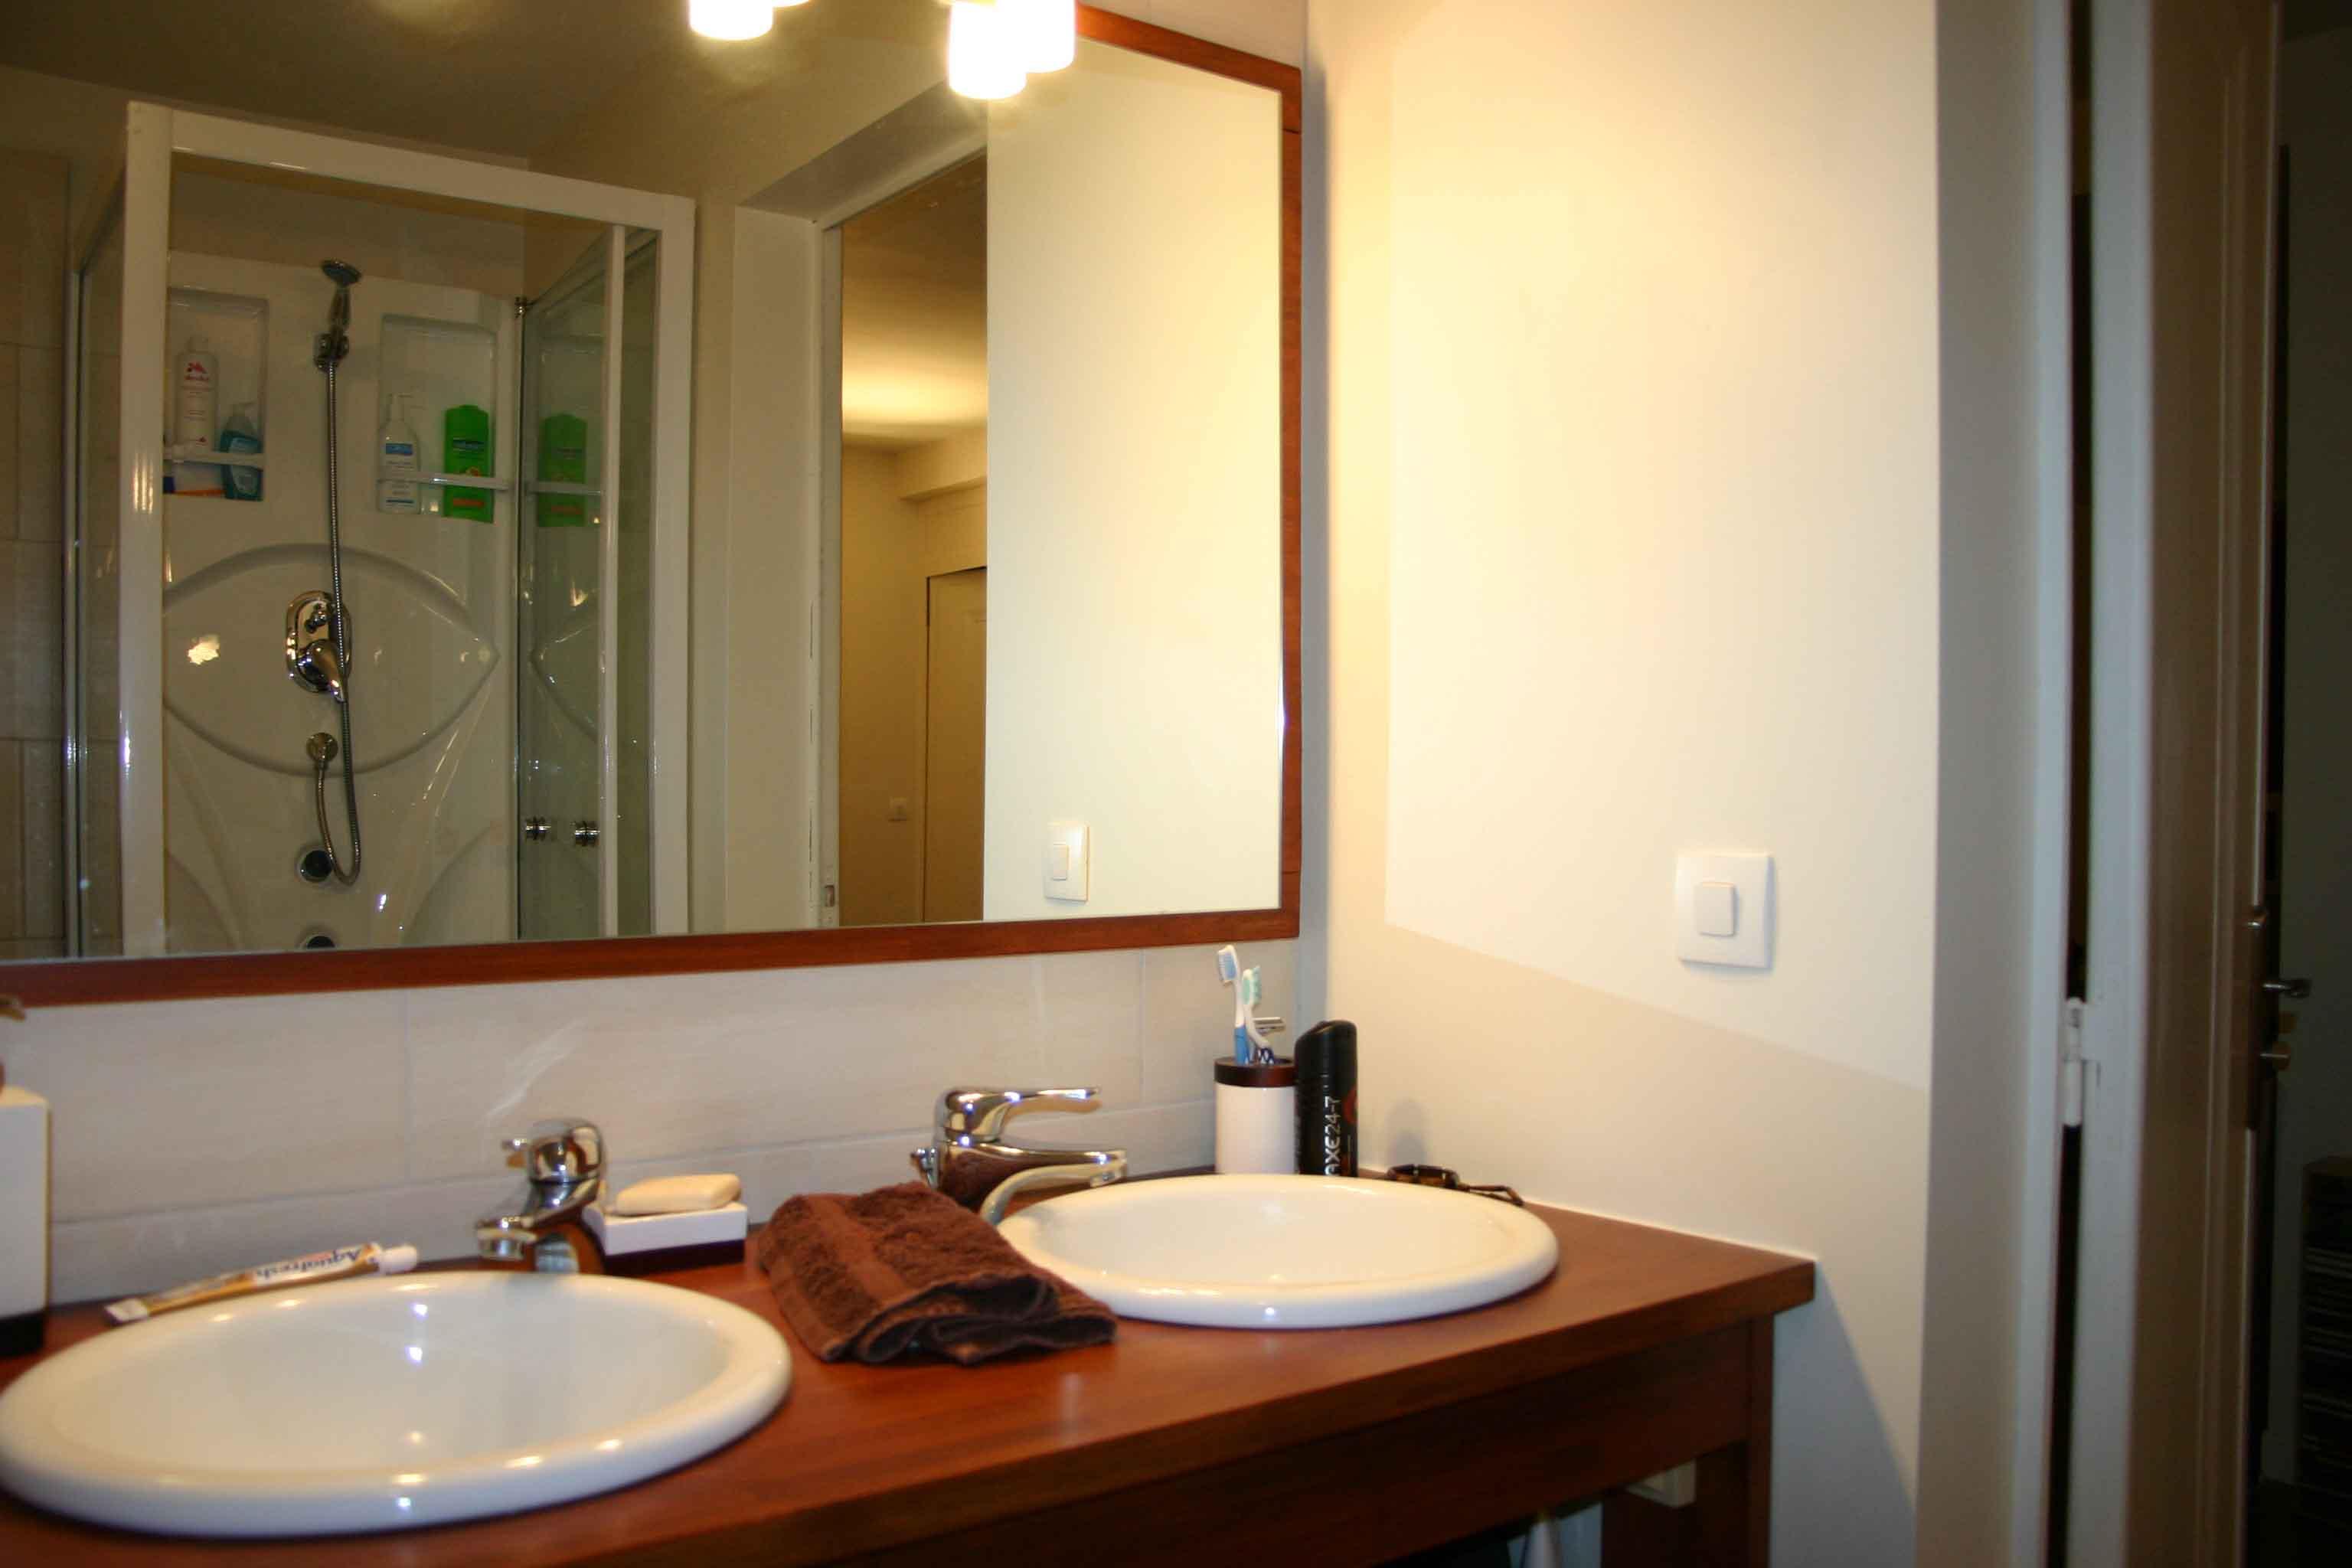 La salle de bain at v e n d u for Recherche grand miroir